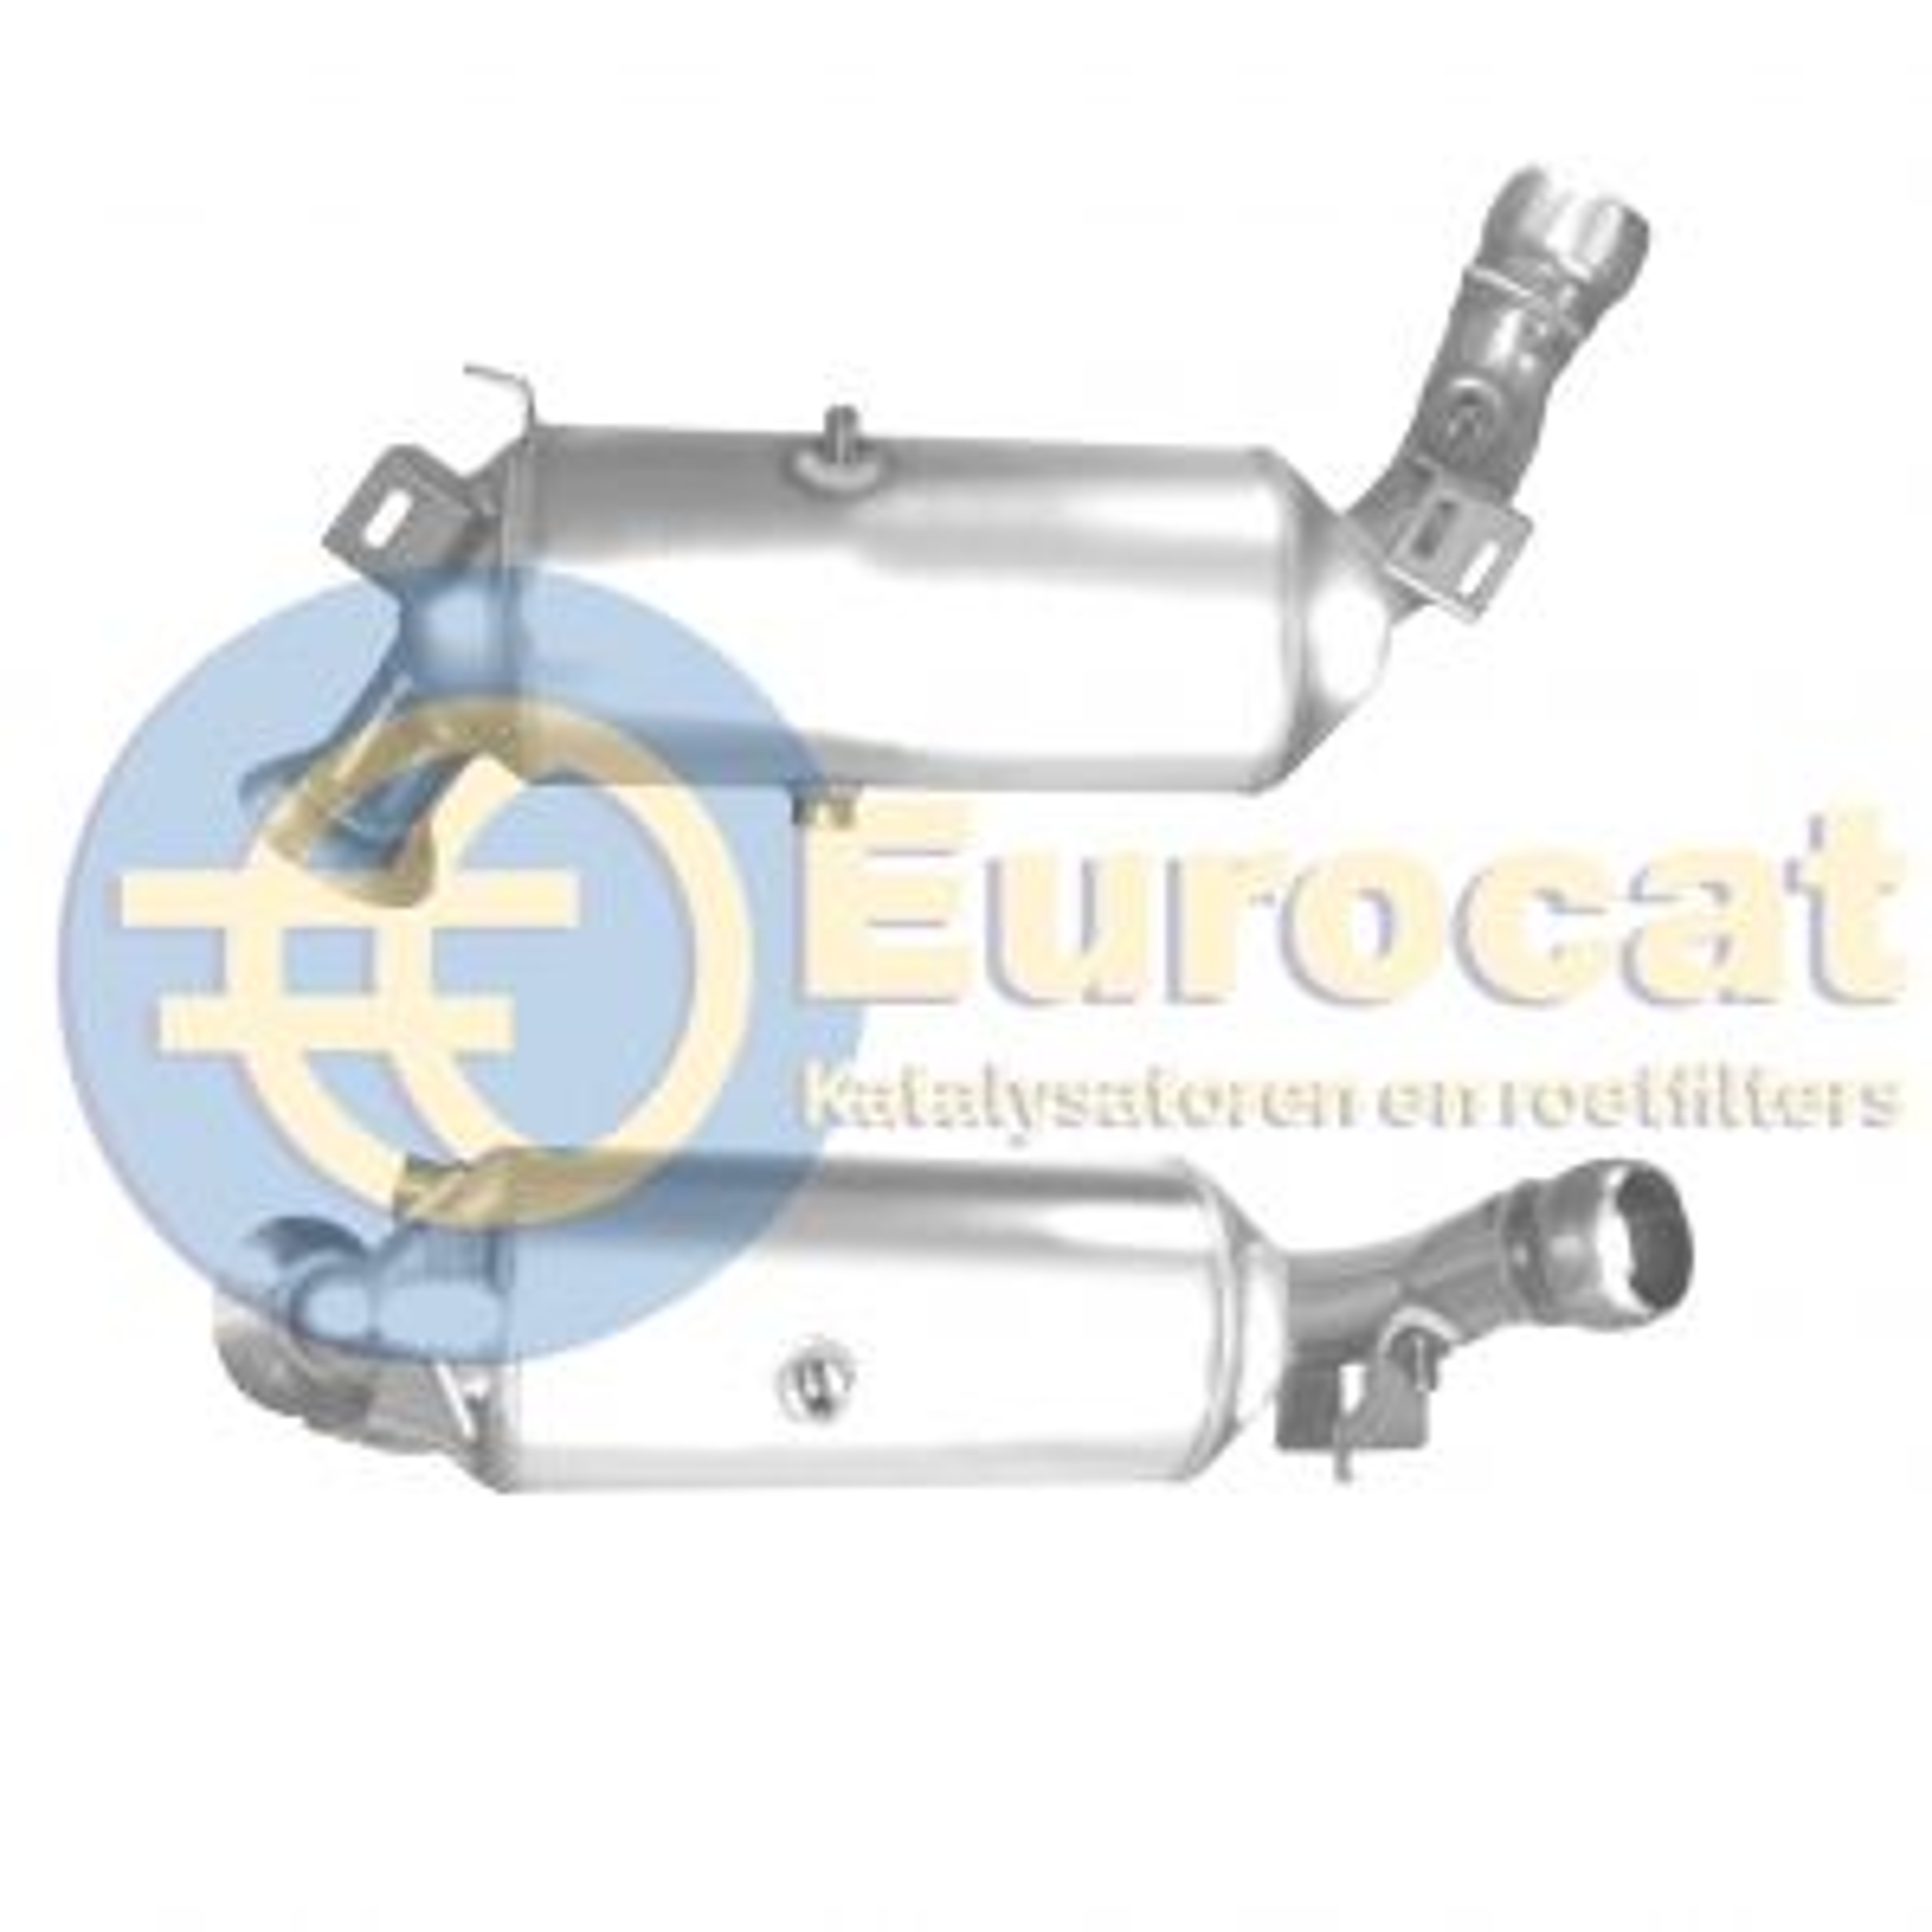 C200 / C220 (CDi) 01/07-  roetfilter cordieriet